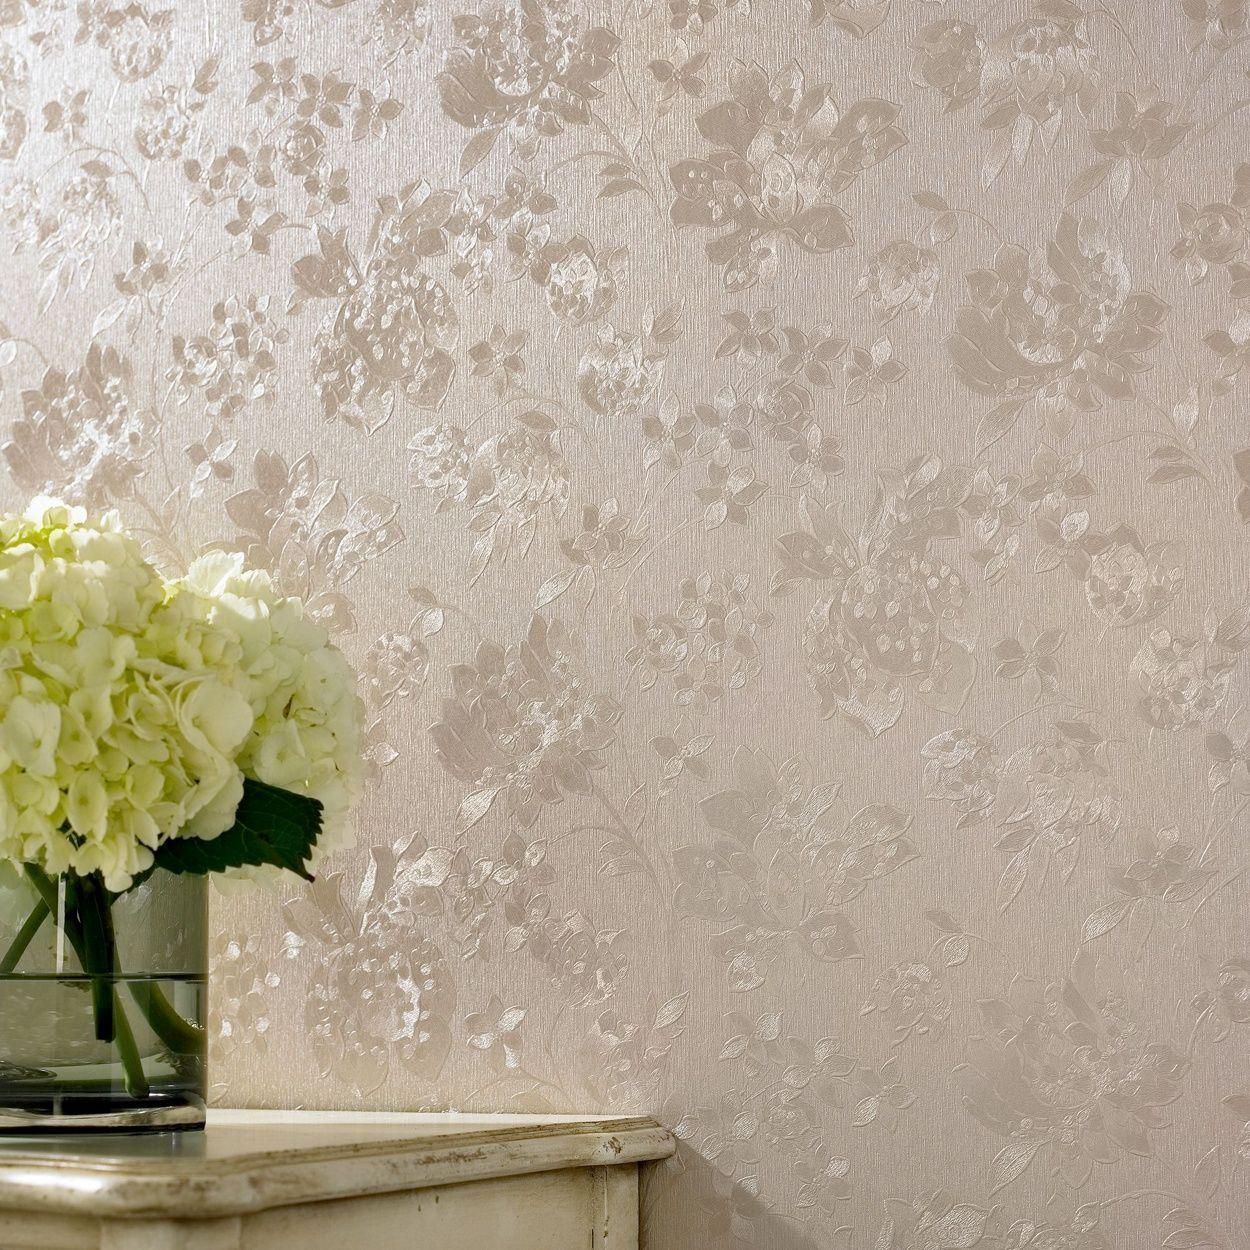 Superfresco Golden Floral Silk wallpaper at